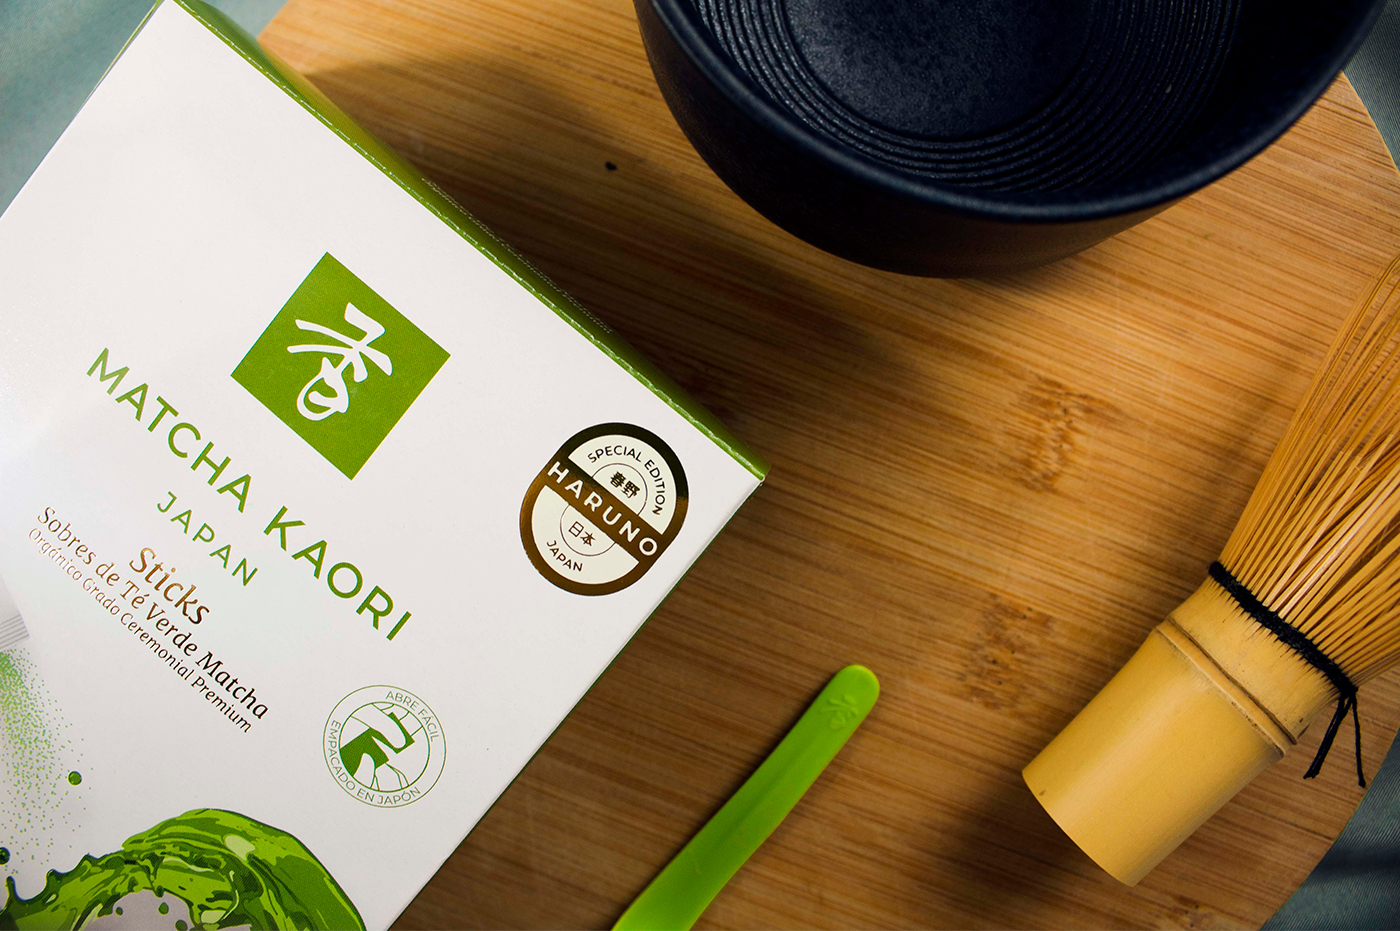 Rebranding of Matcha Kaori a Mexican Brand of Japanese Matcha Green Tea by Armatoste